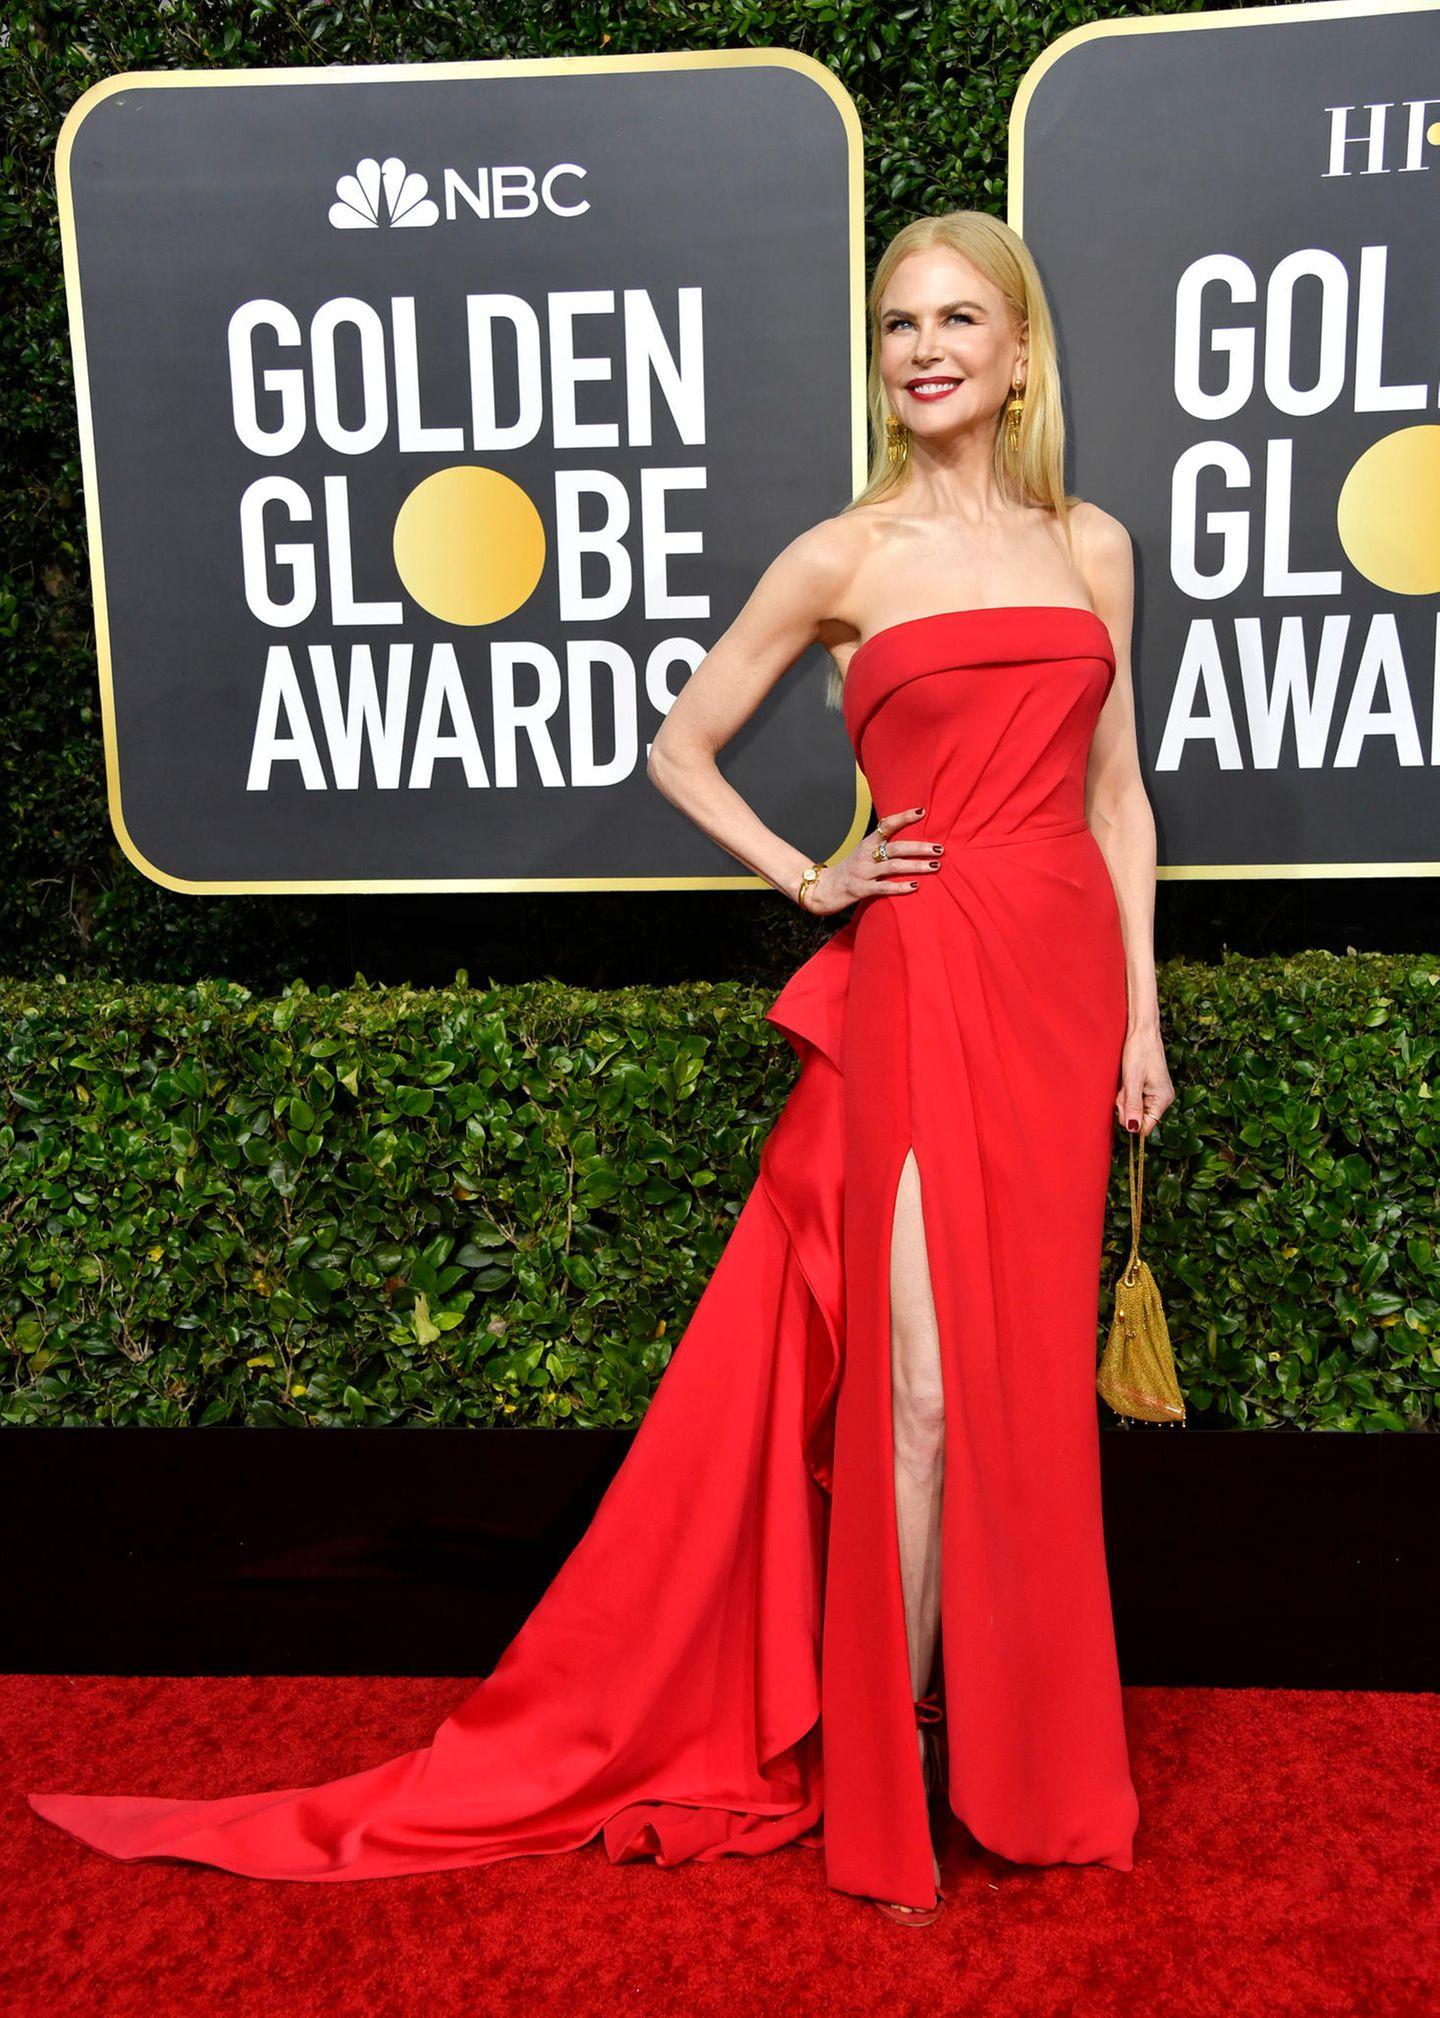 Golden Globes 2020: Nicole Kidman